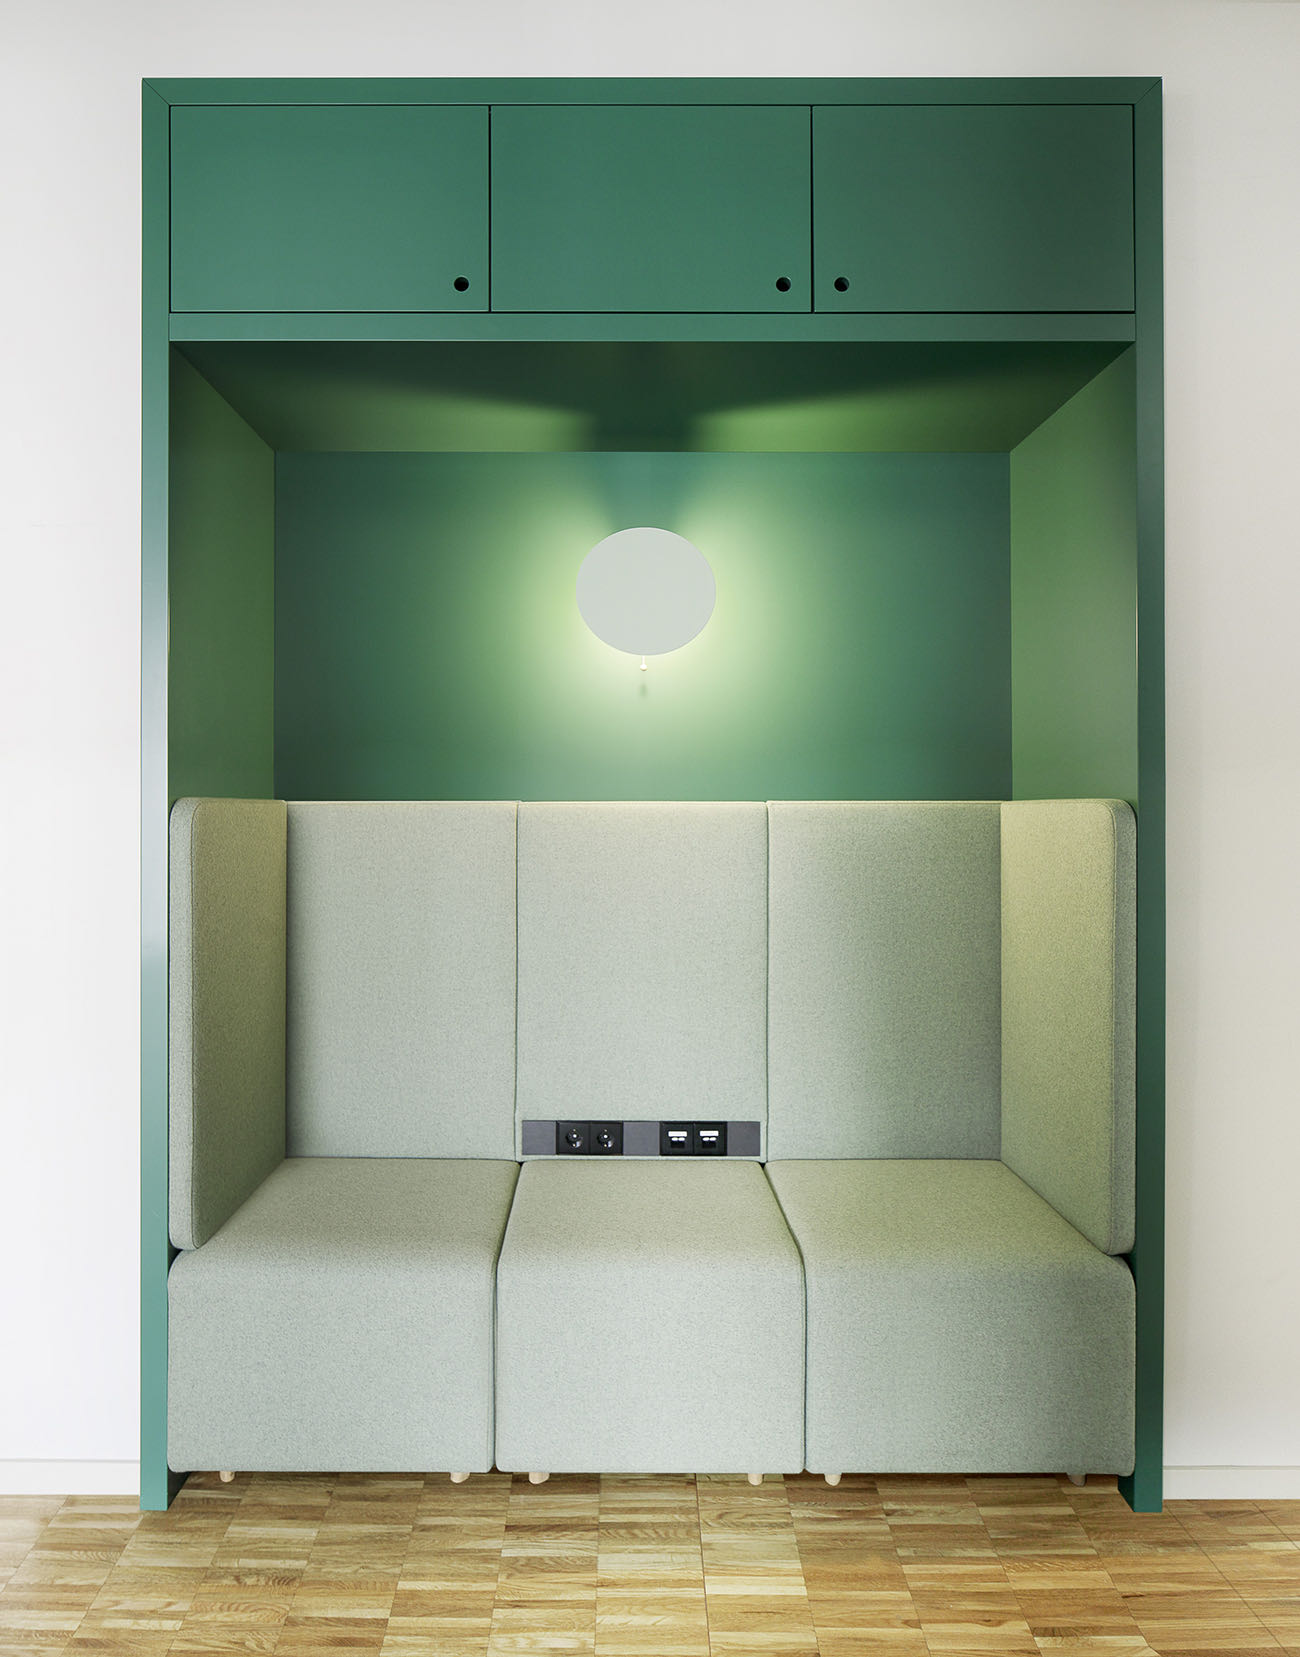 velokonzept-berlin-office-5